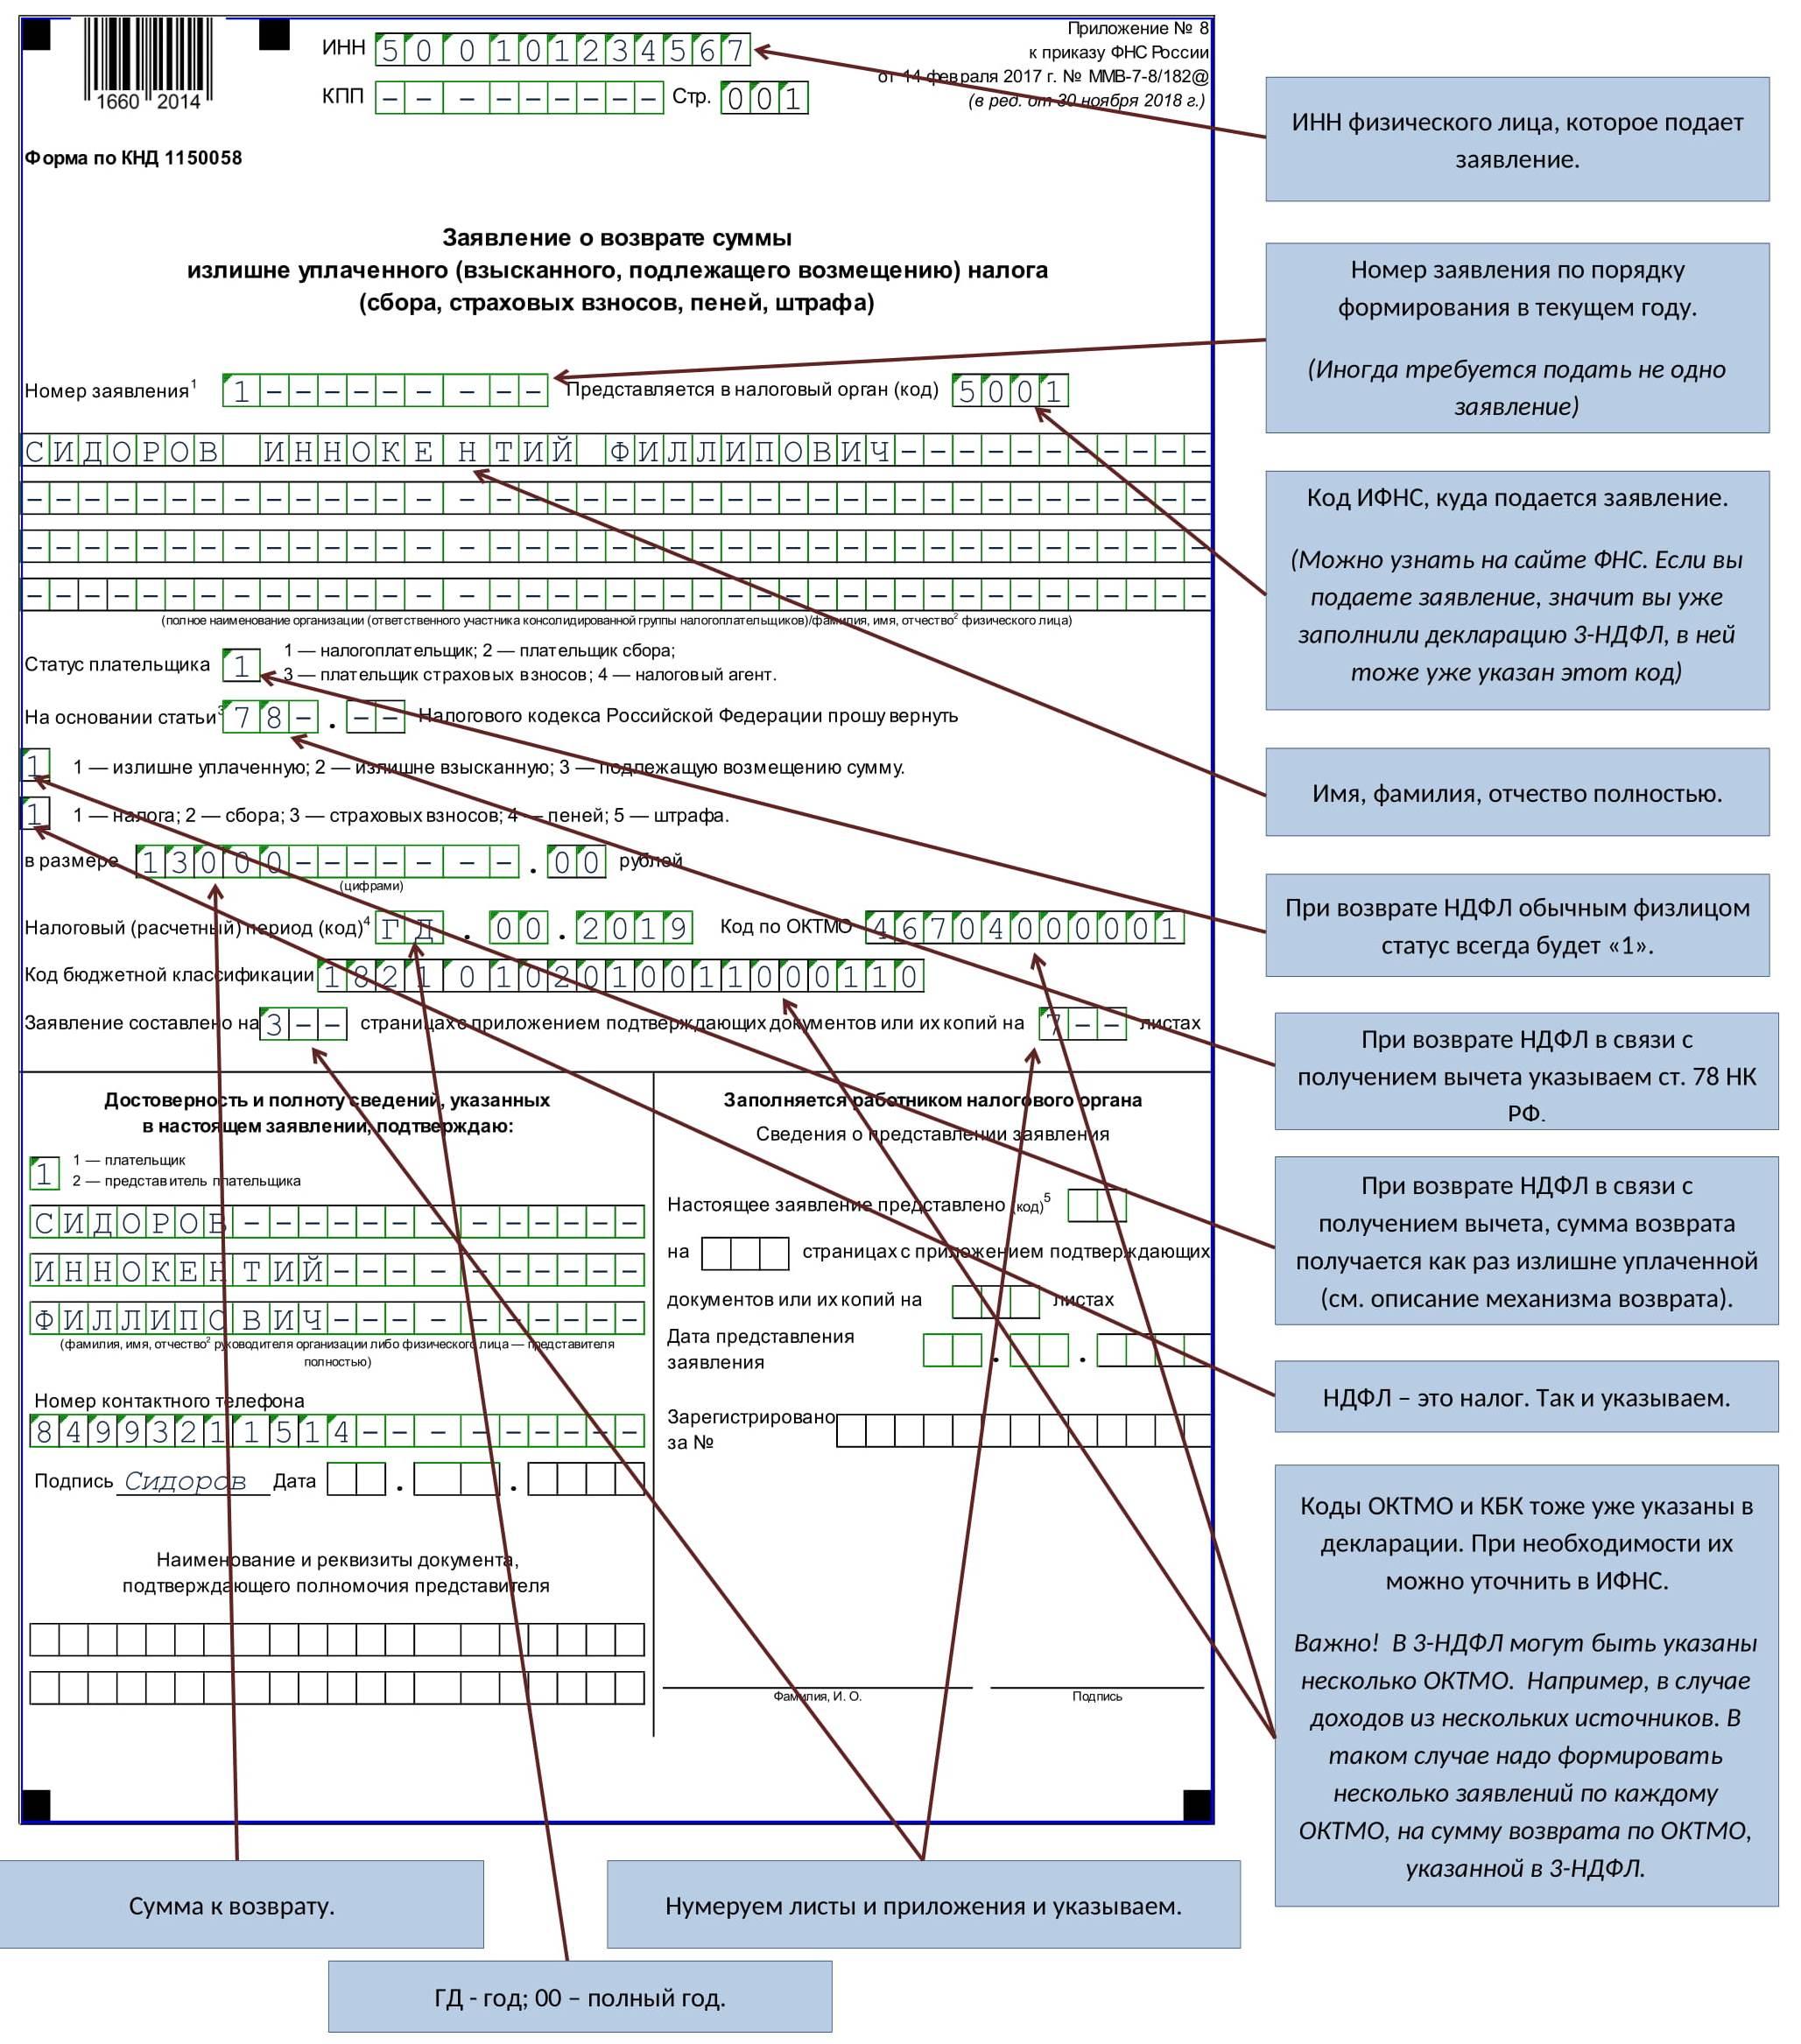 Образец заполнения заявления на возврат ндфл за лечение 2021